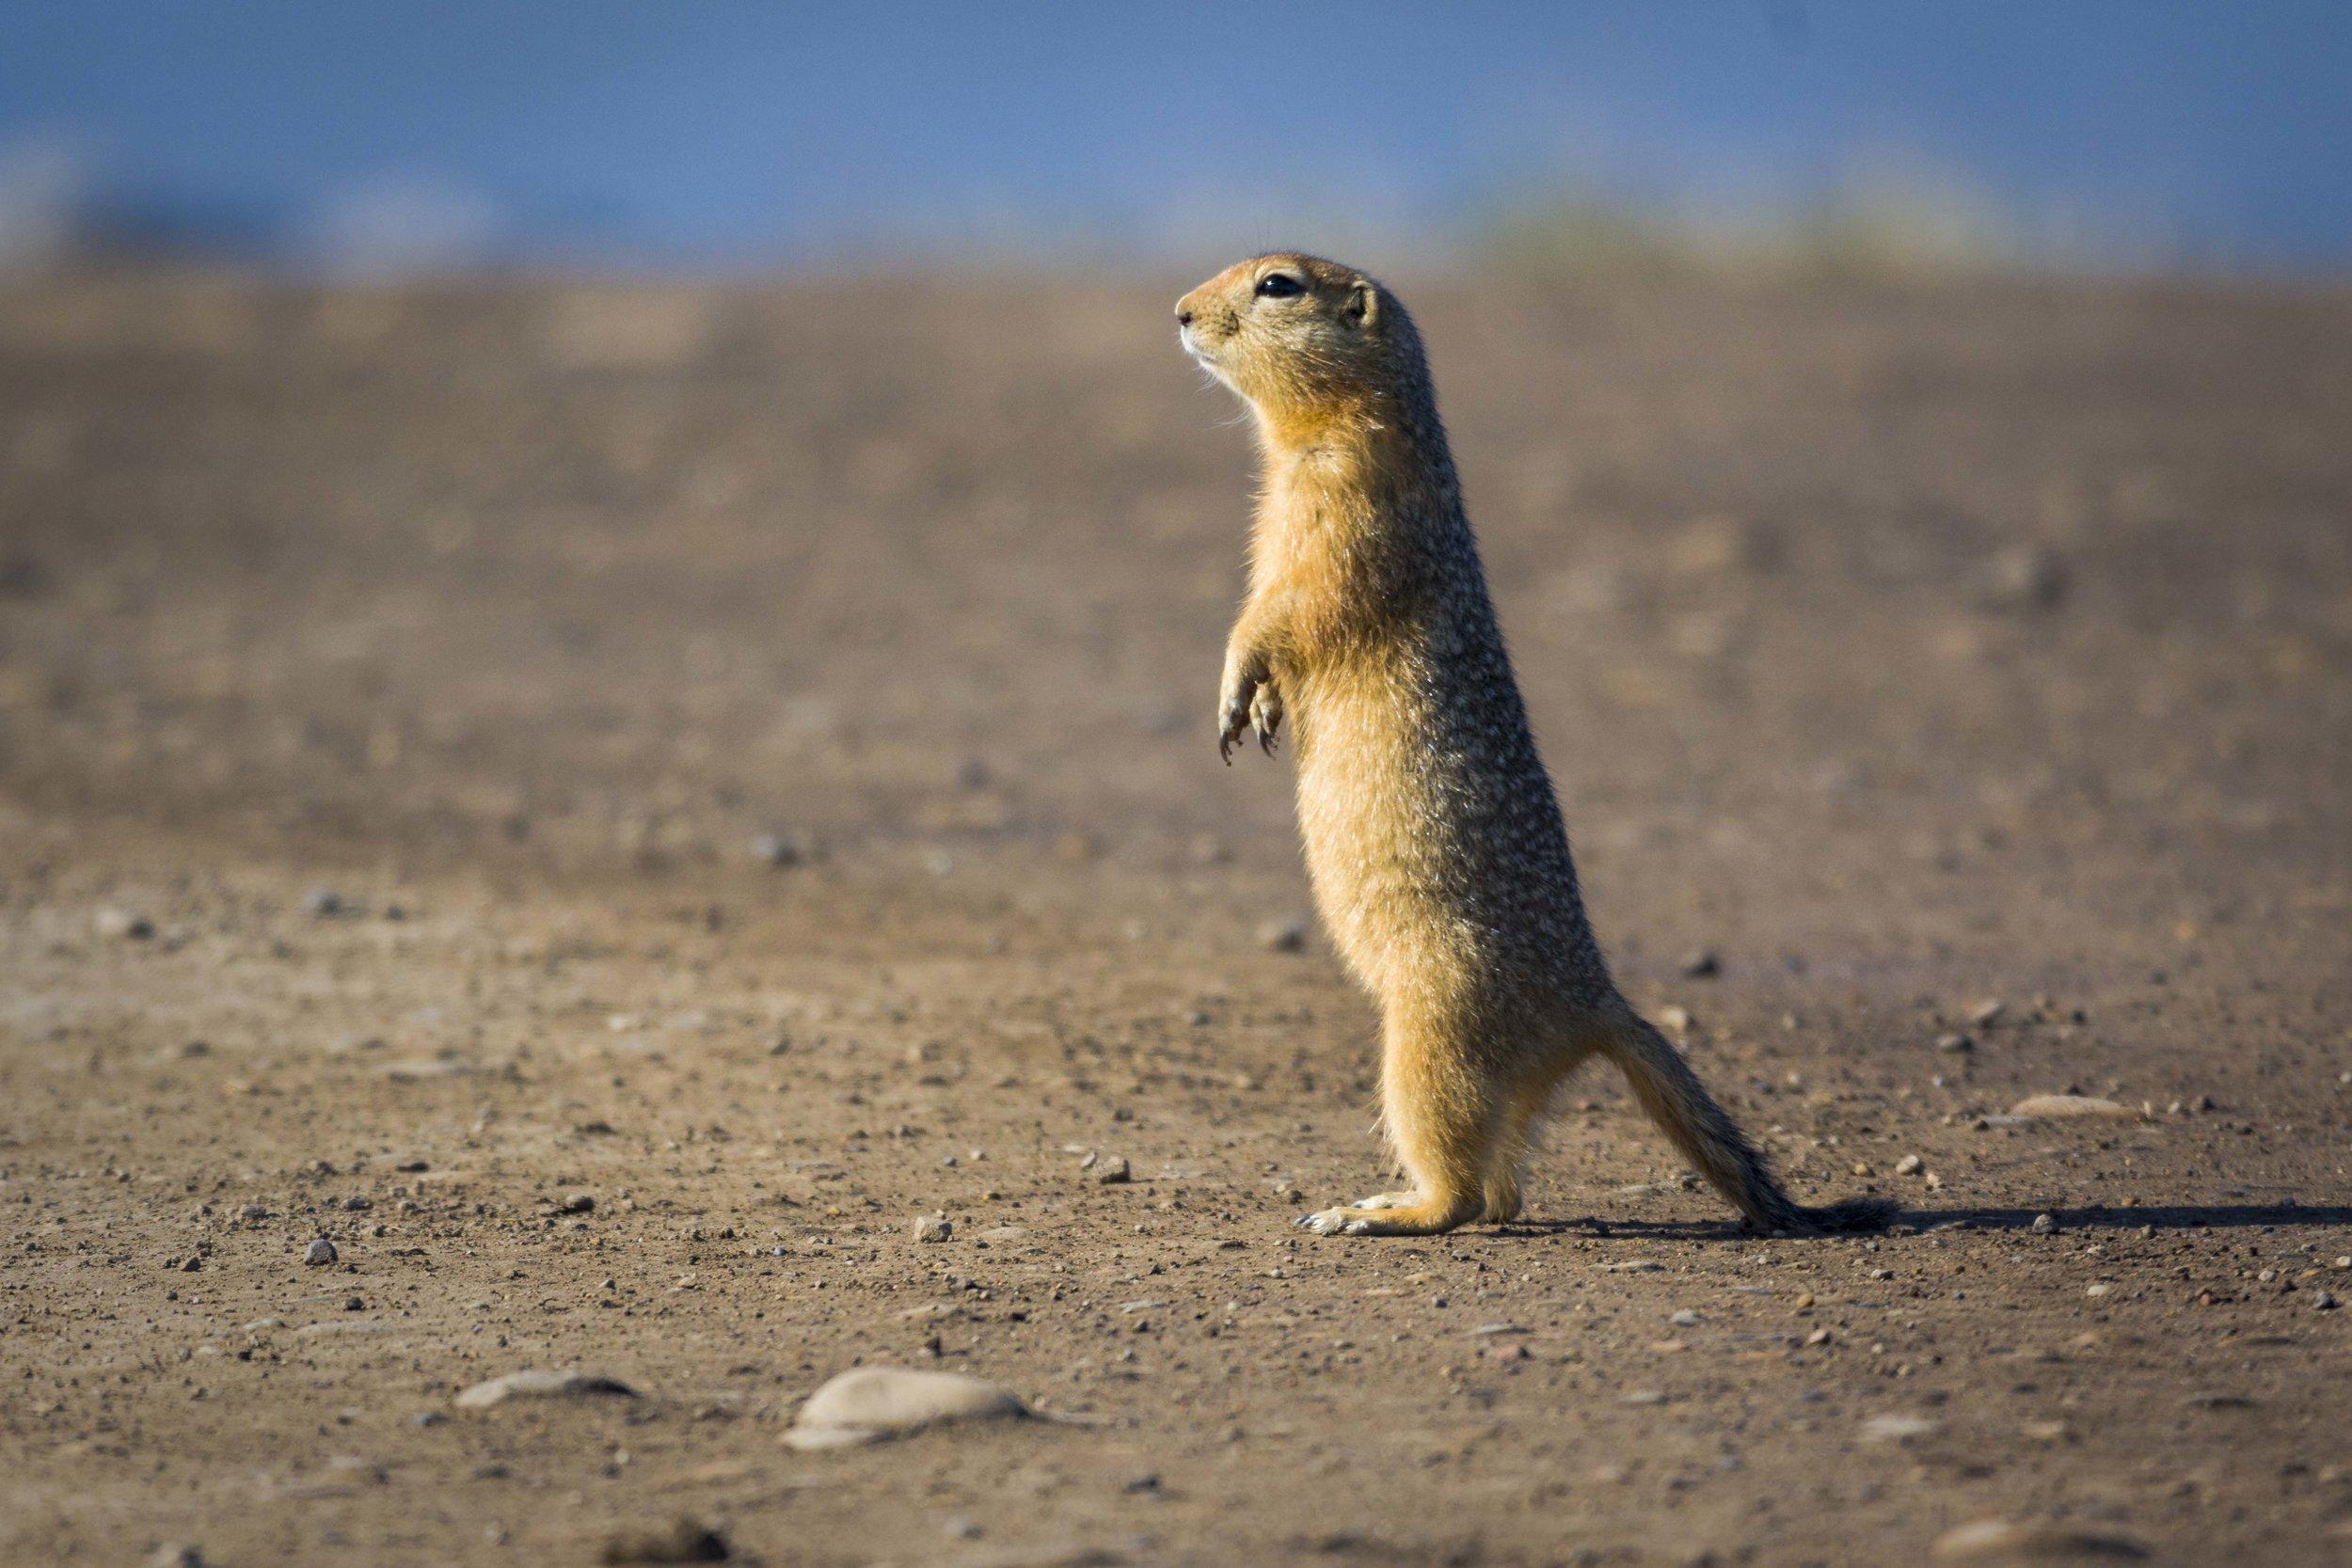 Dempster Highway, Roadtrip, Landscape, Arctic, rob gubiani, Tundra, Tombstone, Tuktoyuktuk, Inuvik, Dempster, Yukon, travel, wanderlust, gopher, ground hog, woodchuck, rodent,